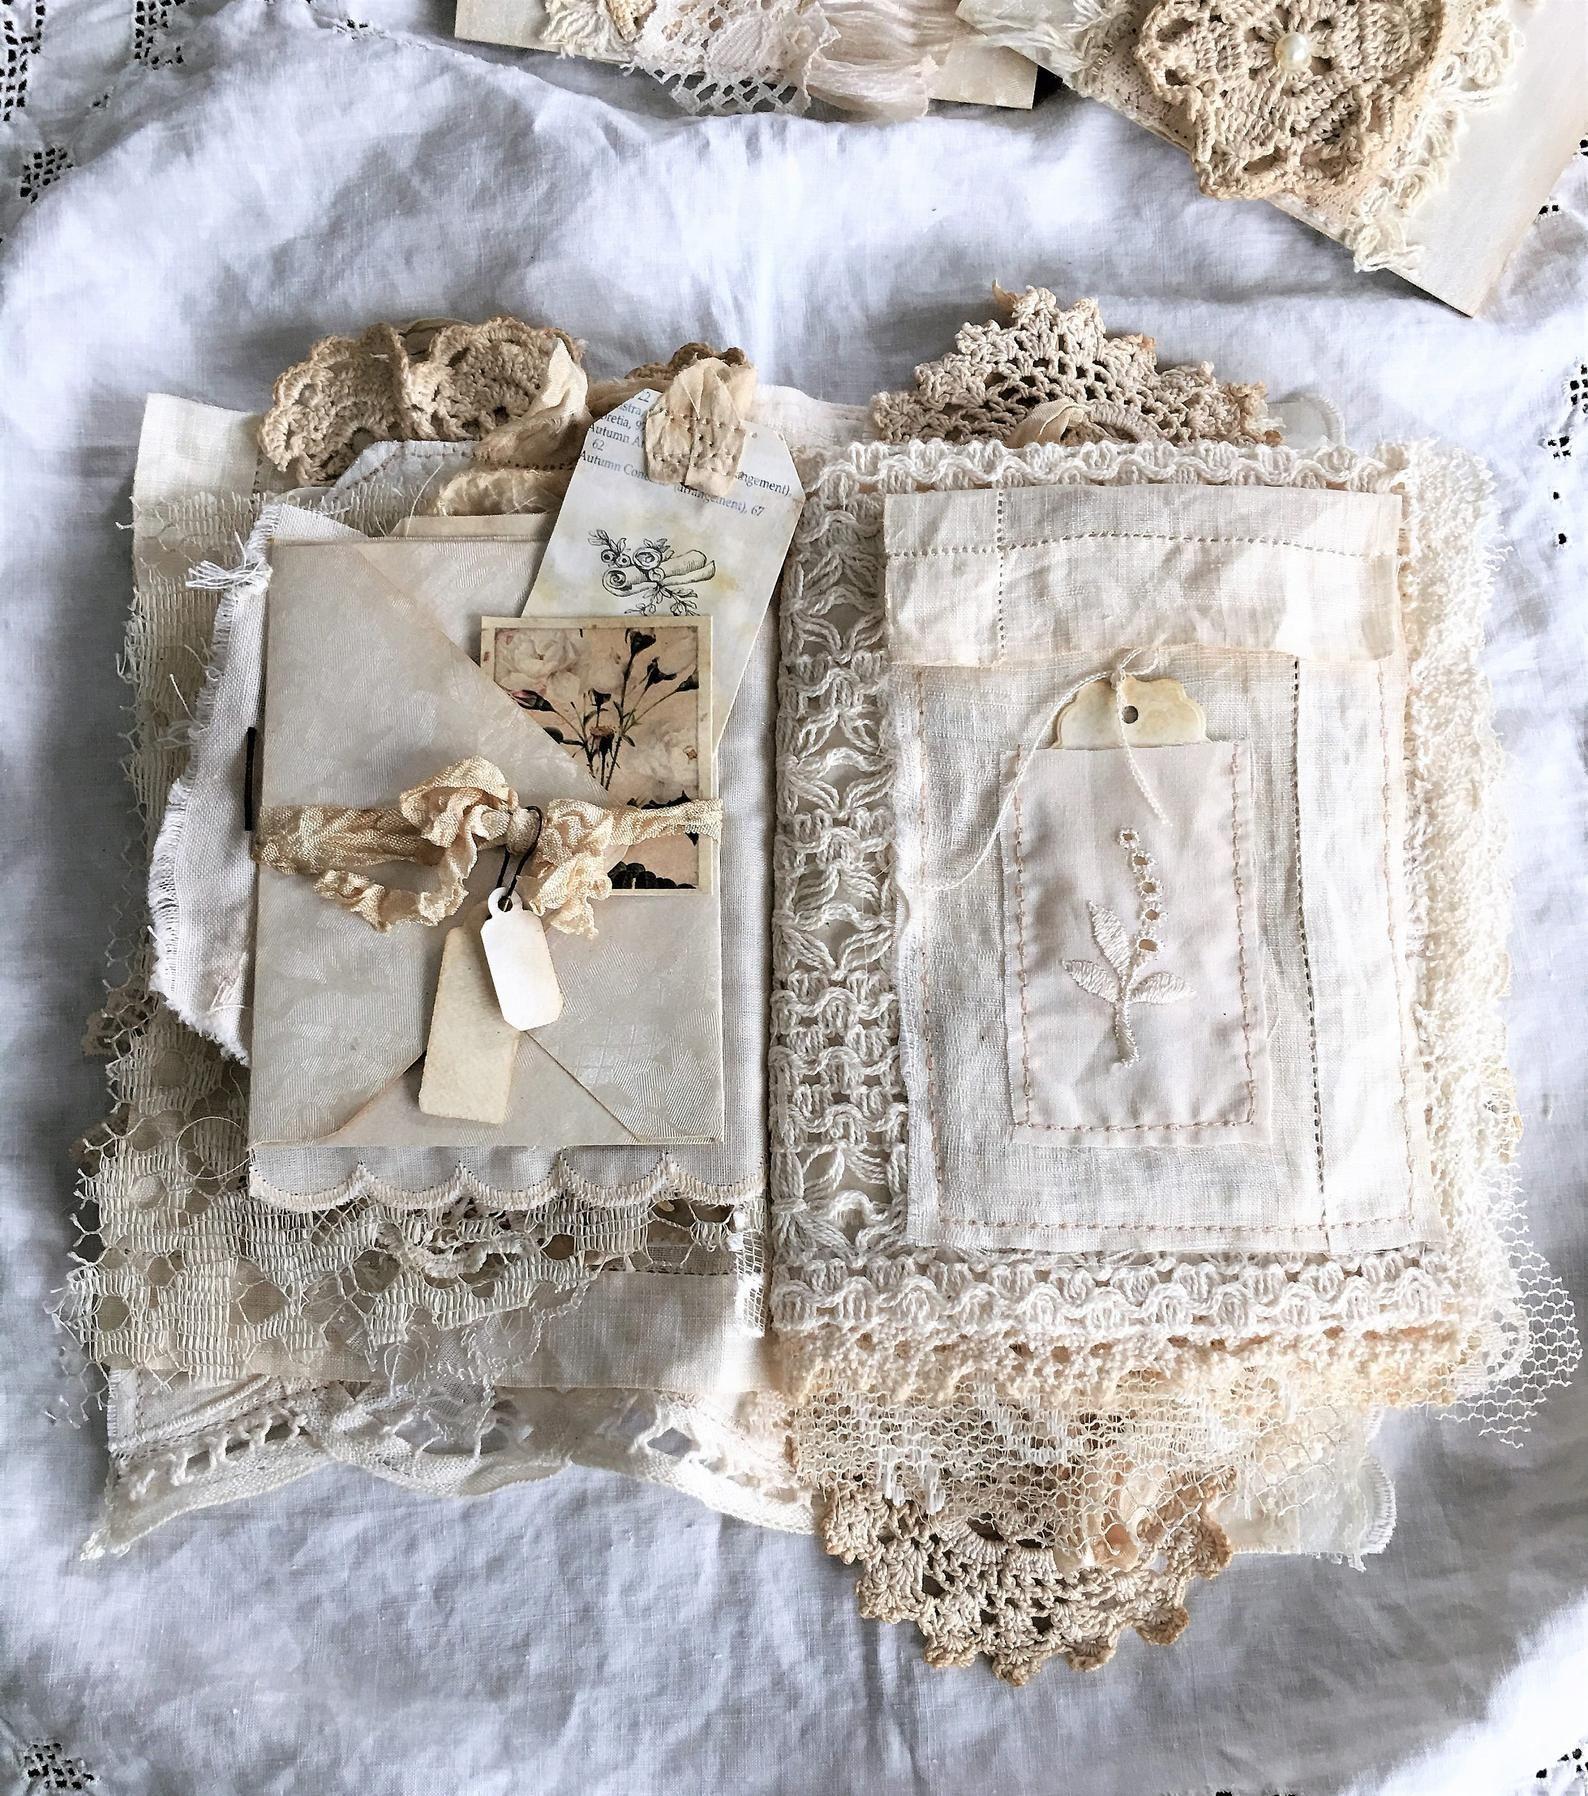 Reserved Vintage Linen And Lace Journal Heirloom Journal Etsy In 2020 Linens And Lace Fabric Journals Vintage Linens